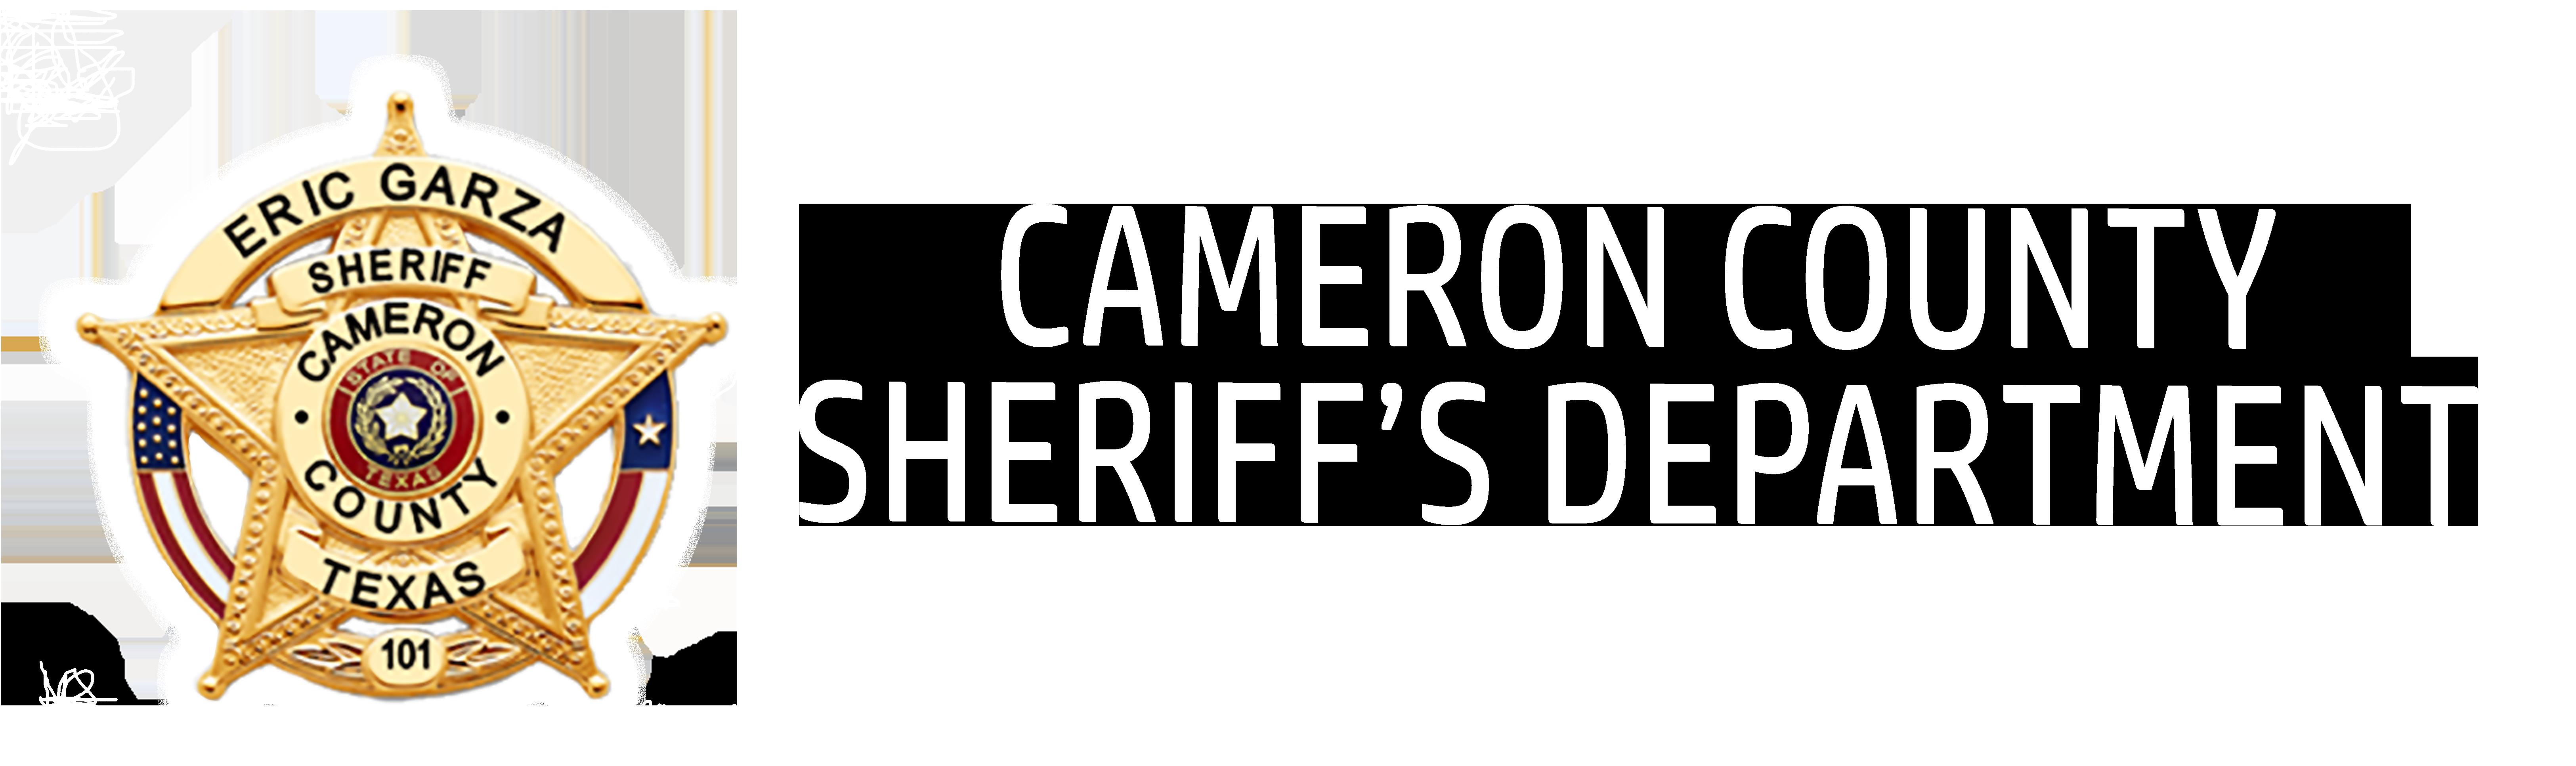 Cameron County